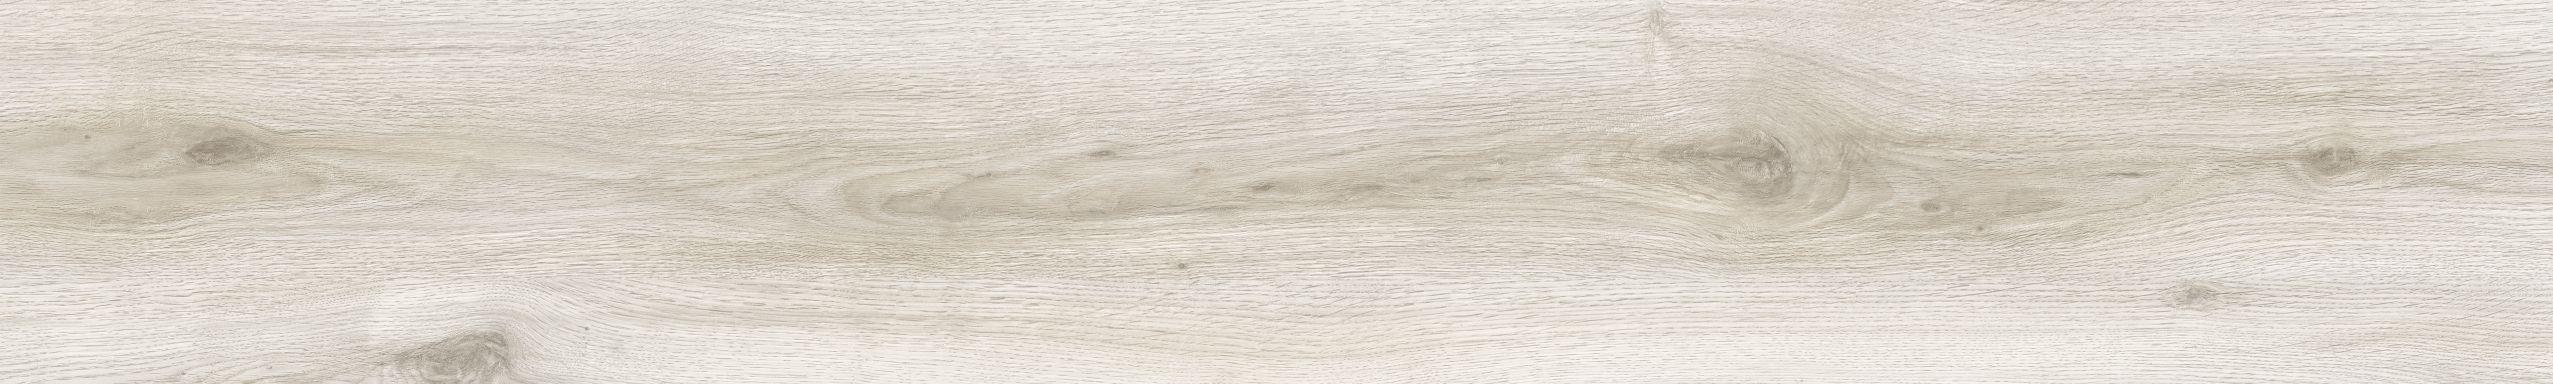 Panele winylowe LVT modulari ® WOOD DRYBACK 19,6 x 132 cm 24126